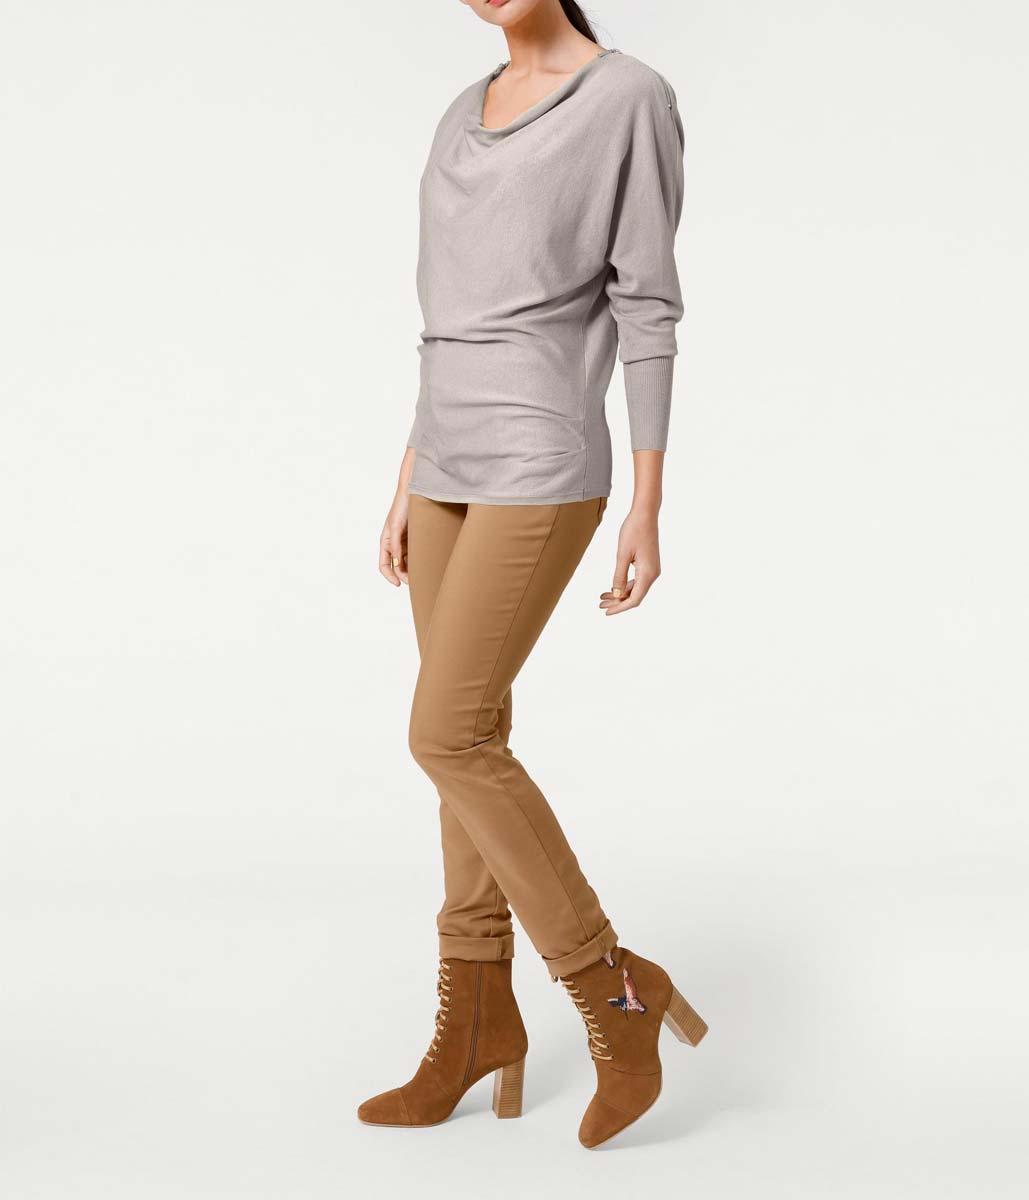 196.924 ASHLEY BROOKE Damen Designer-Reißverschlusspullover Kitt